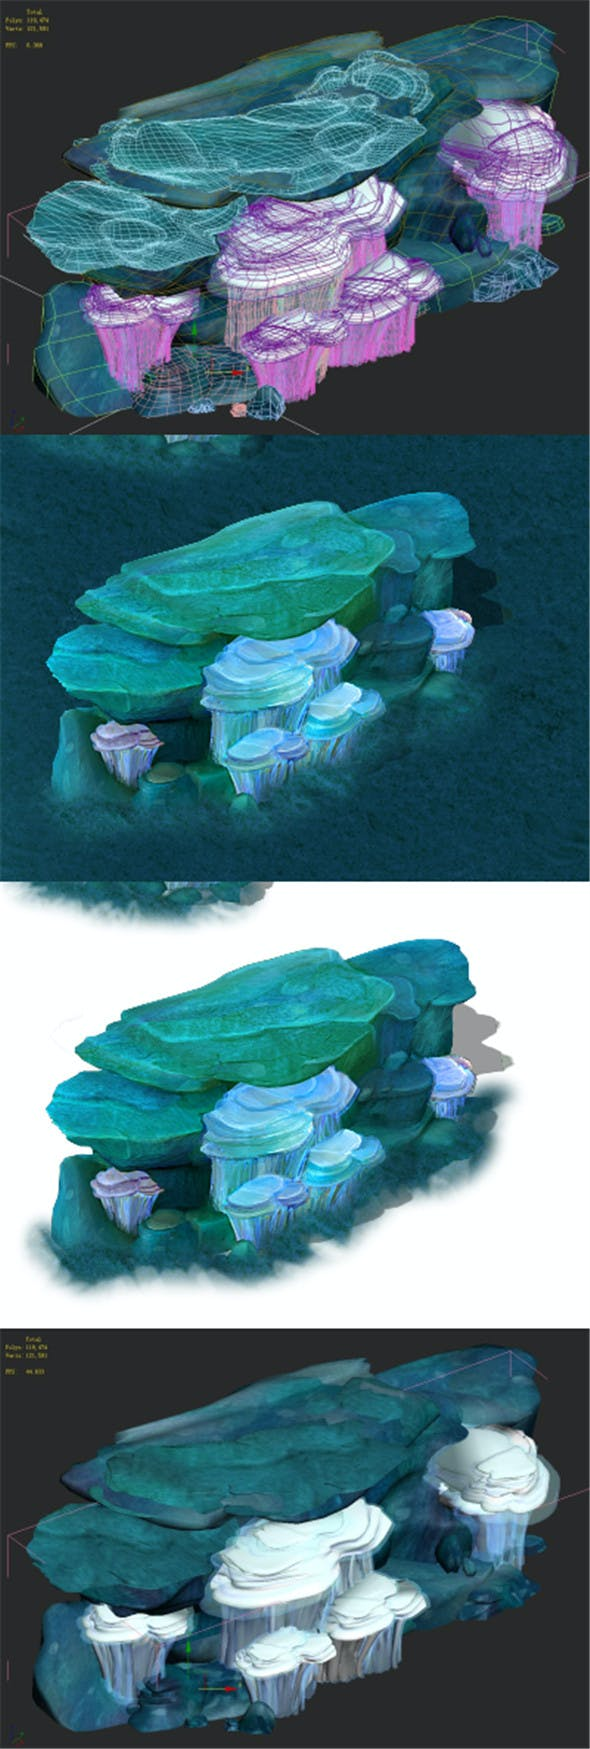 Submarine Cartoon World - Coralstone 03 - 3DOcean Item for Sale